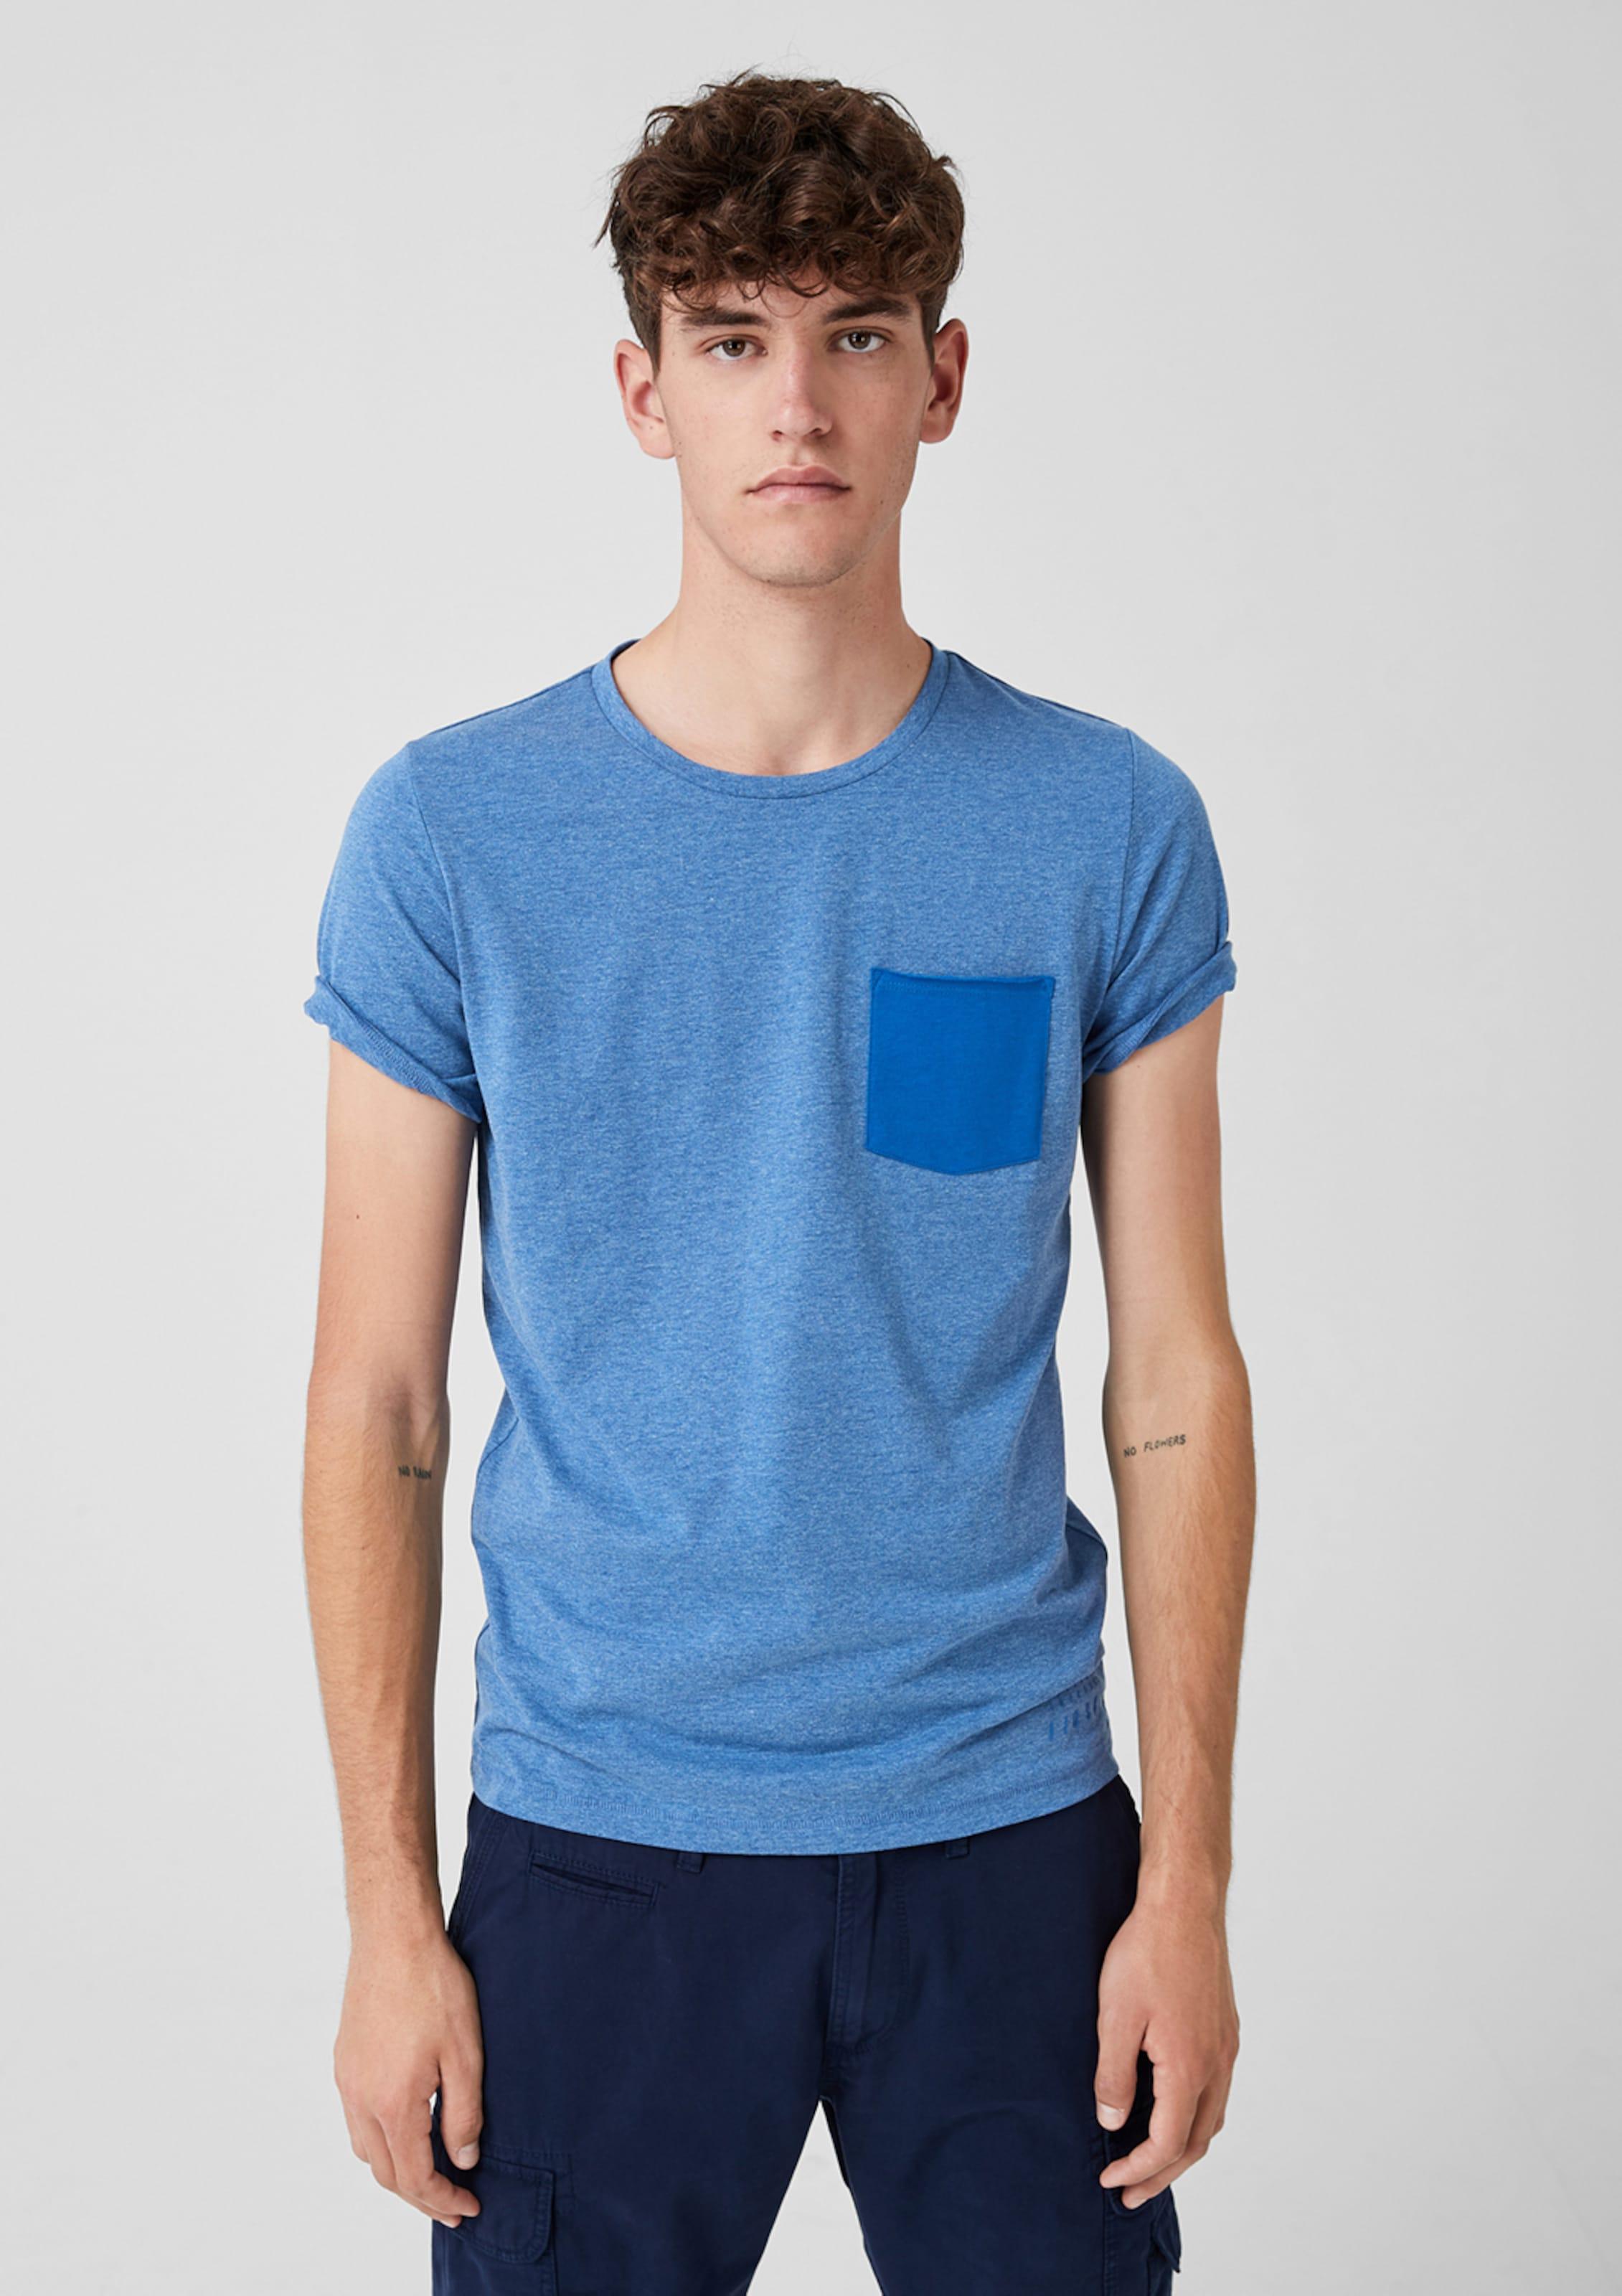 T s Designed In By Q Rauchblau shirt ynvmN80wO